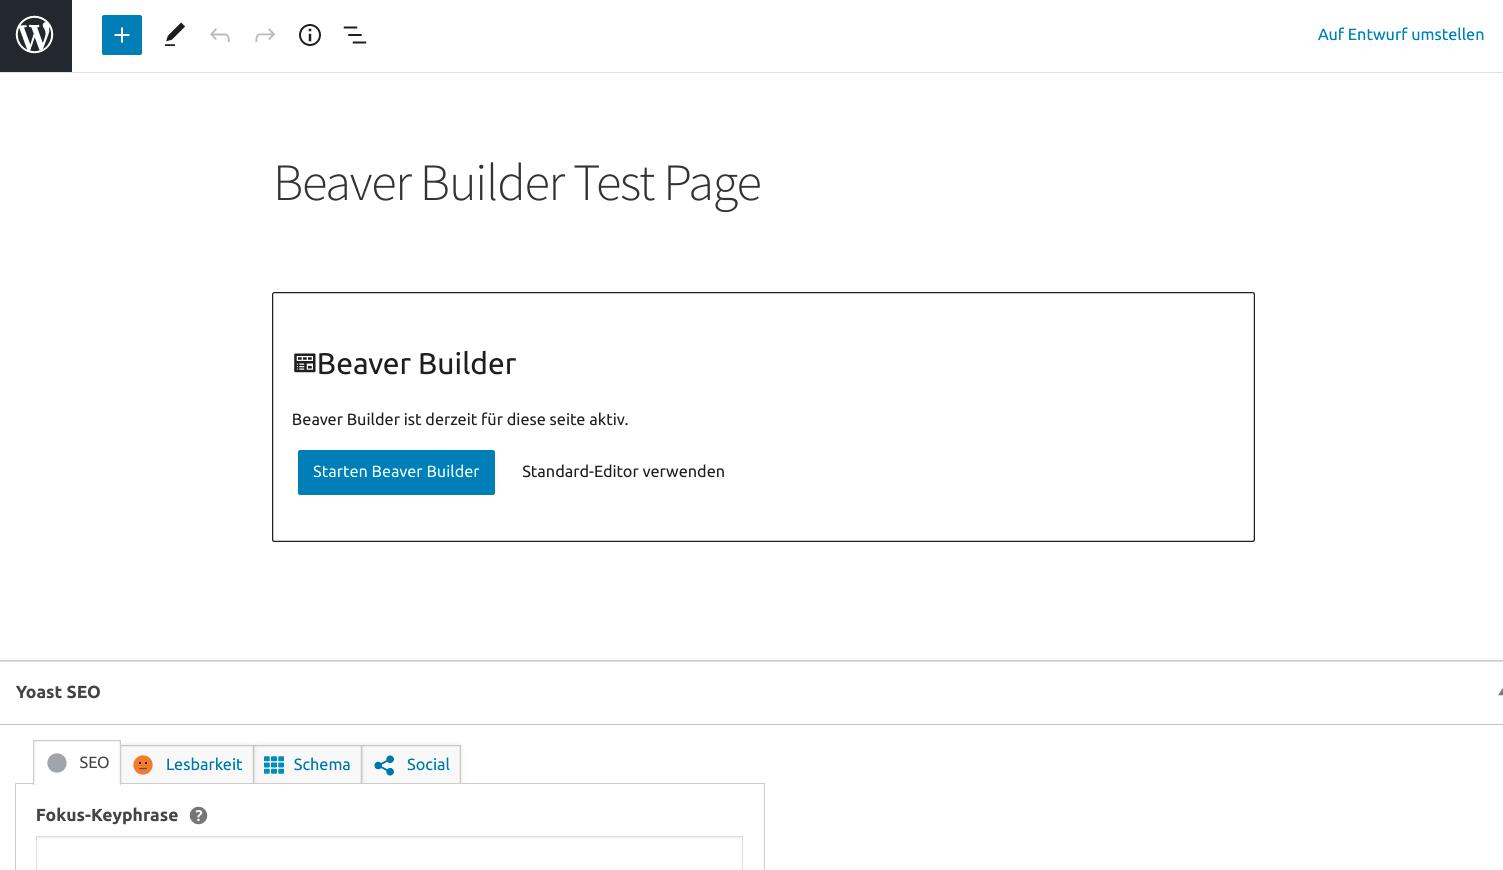 Beaver Builder Testseite